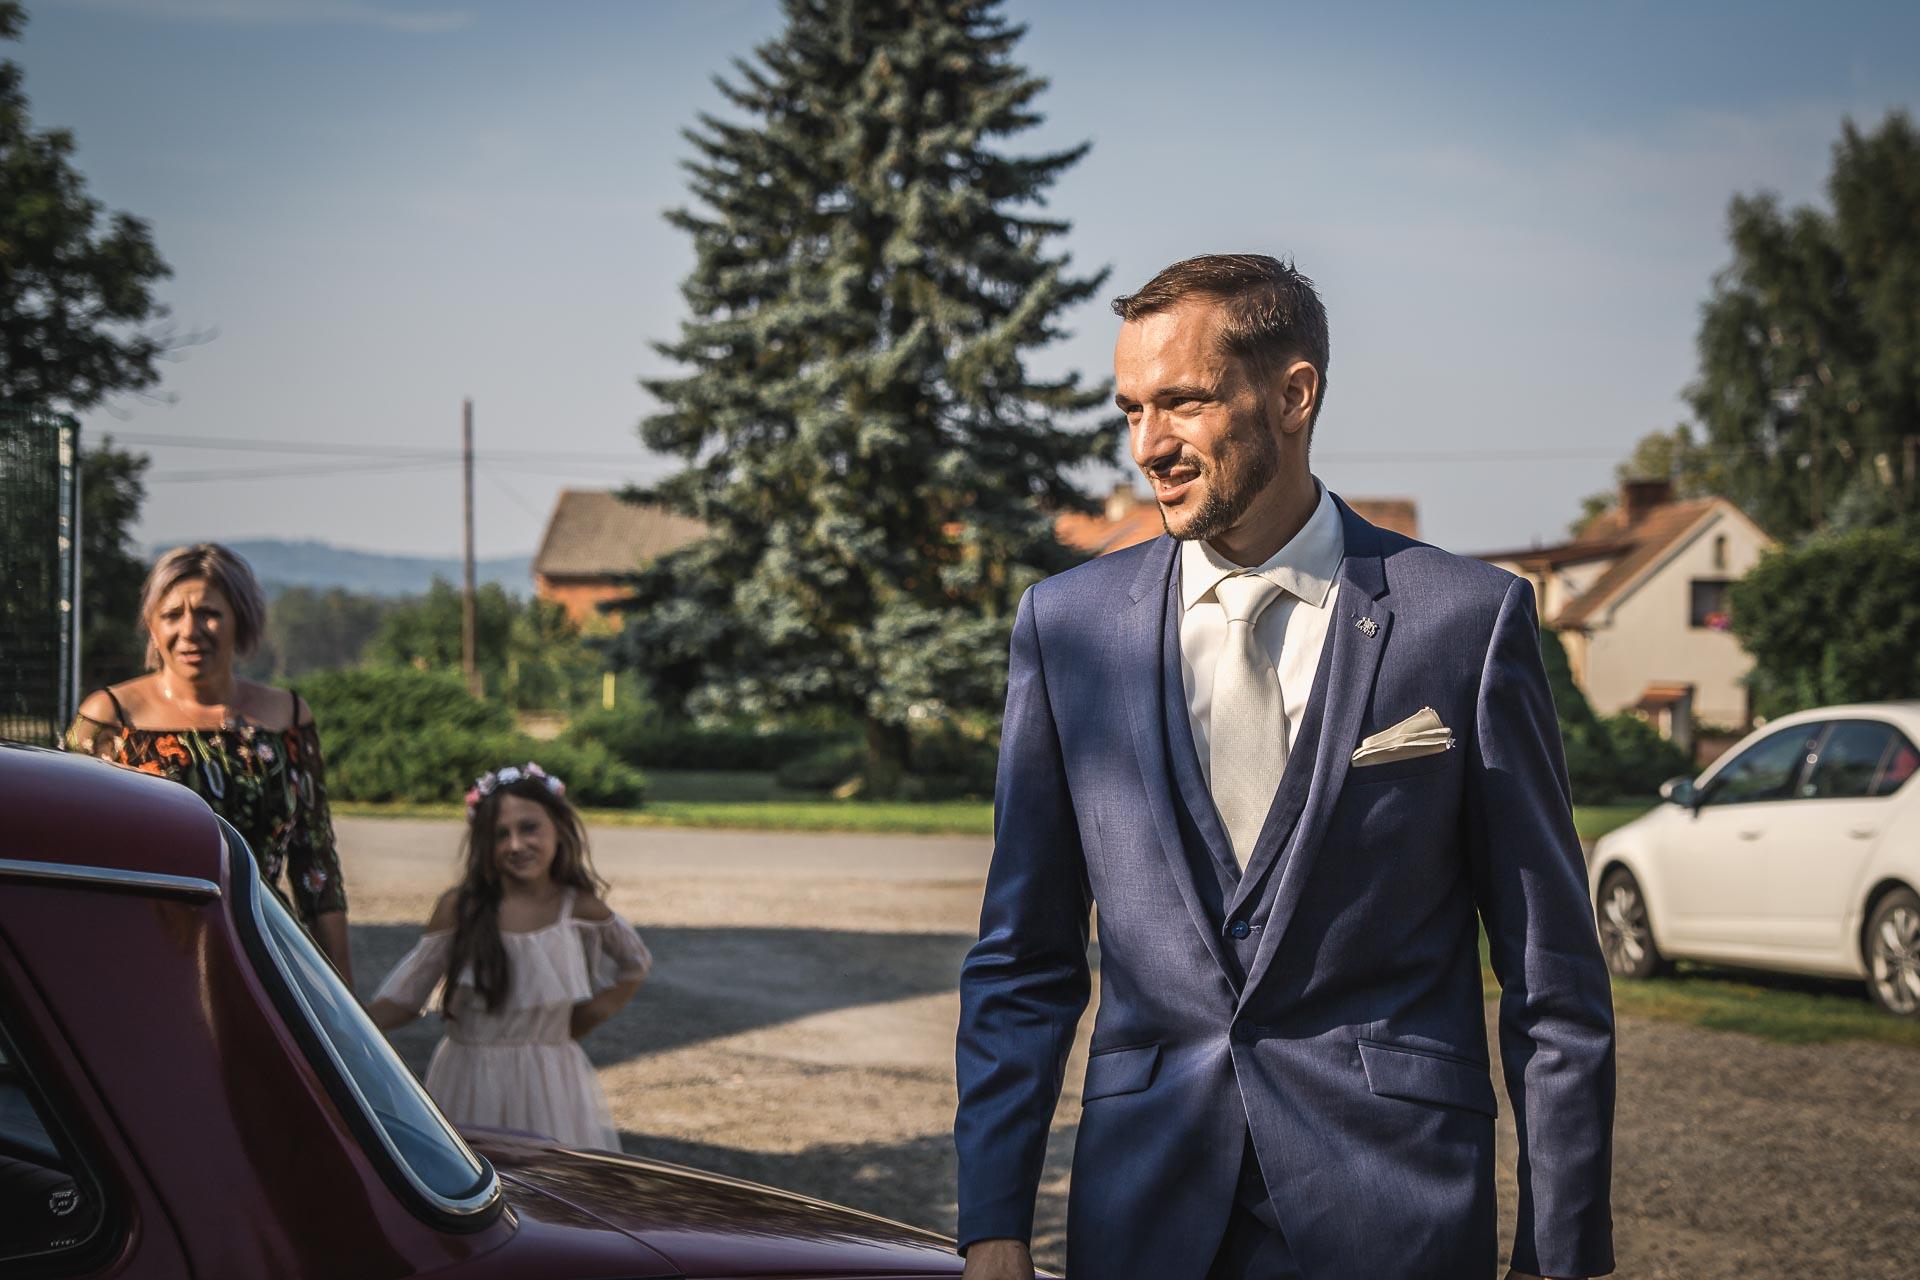 svatební-fotograf-wedding-svatebni-video-orlík-vltava-kostel-statek-stodola-boho-svatba-Beautyfoto-63